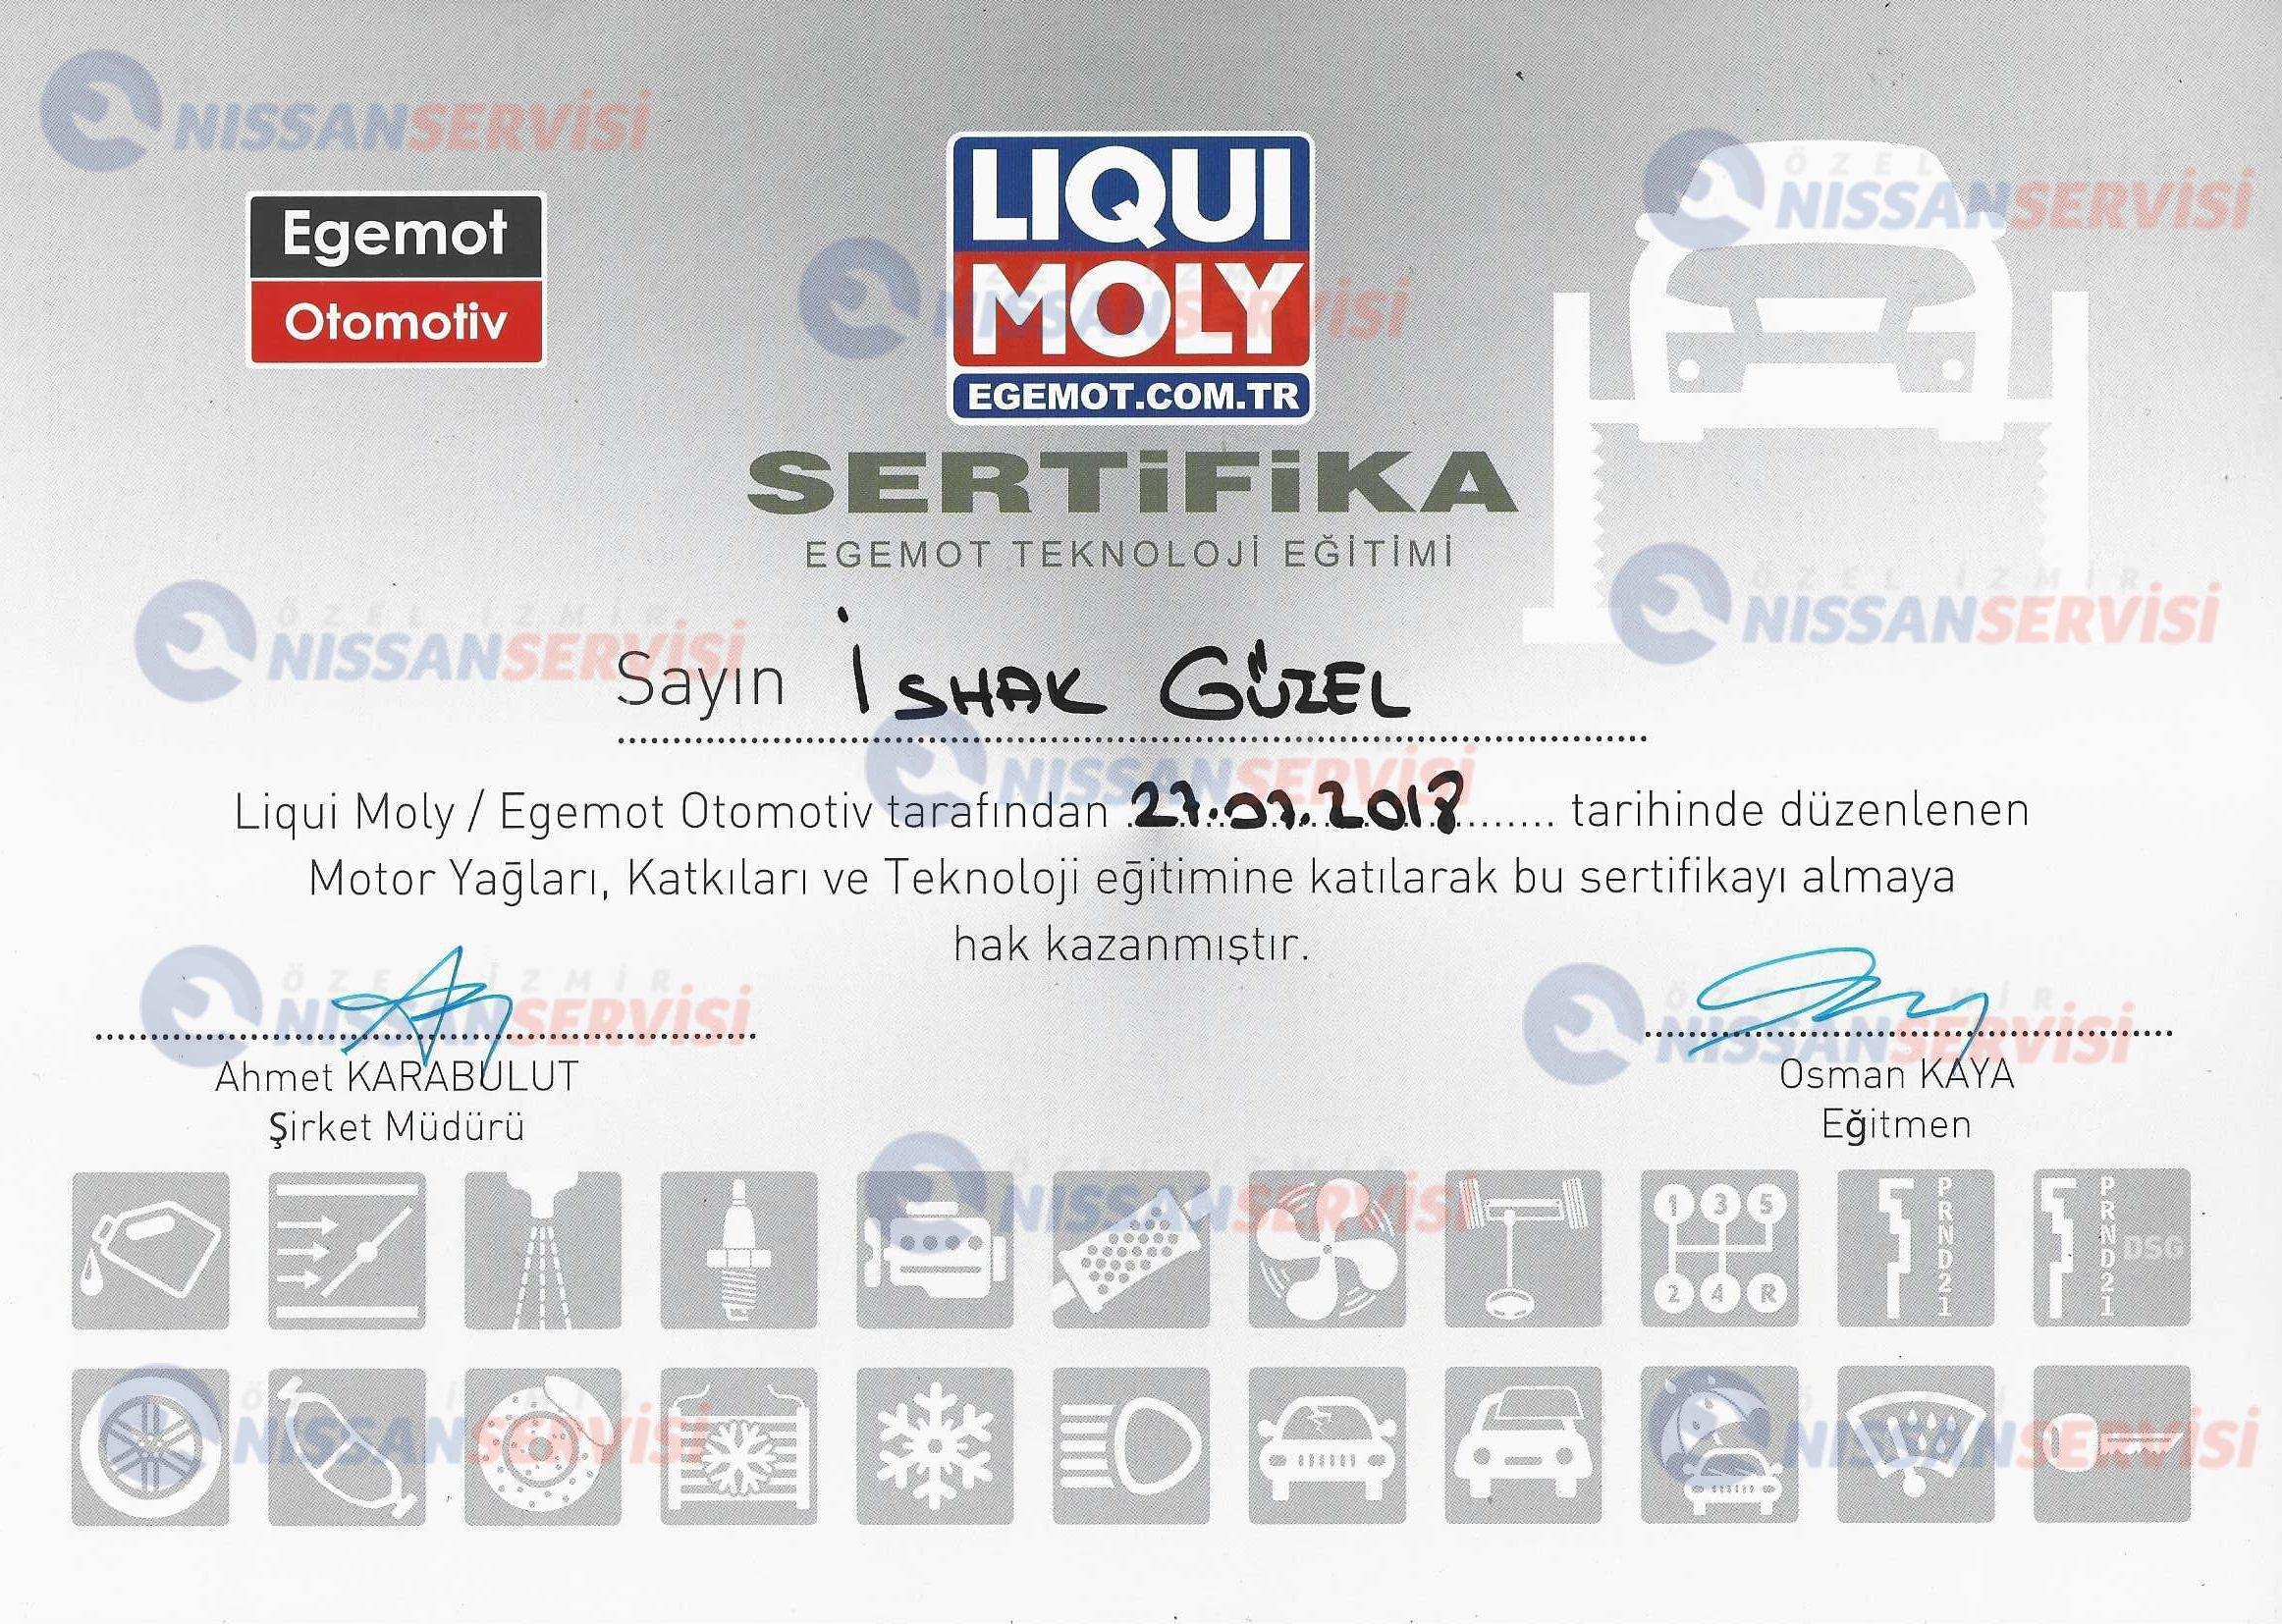 Liqui Moly Egemot Teknoloji Eğitim Sertifikası